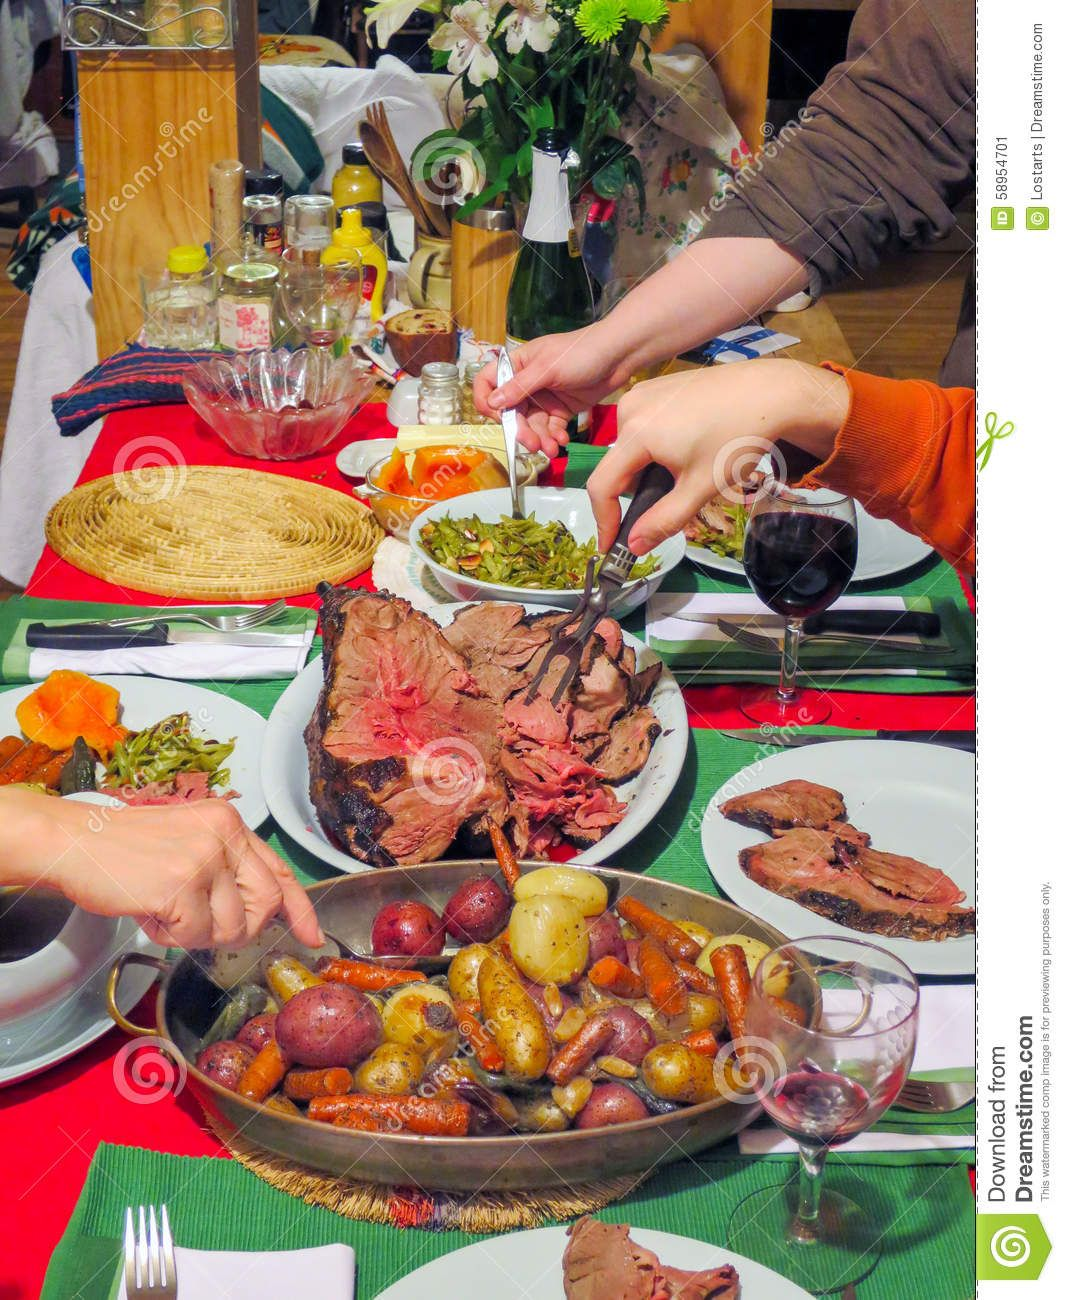 pin by julia middleton on florette table settings lamb dinner table rh pinterest com